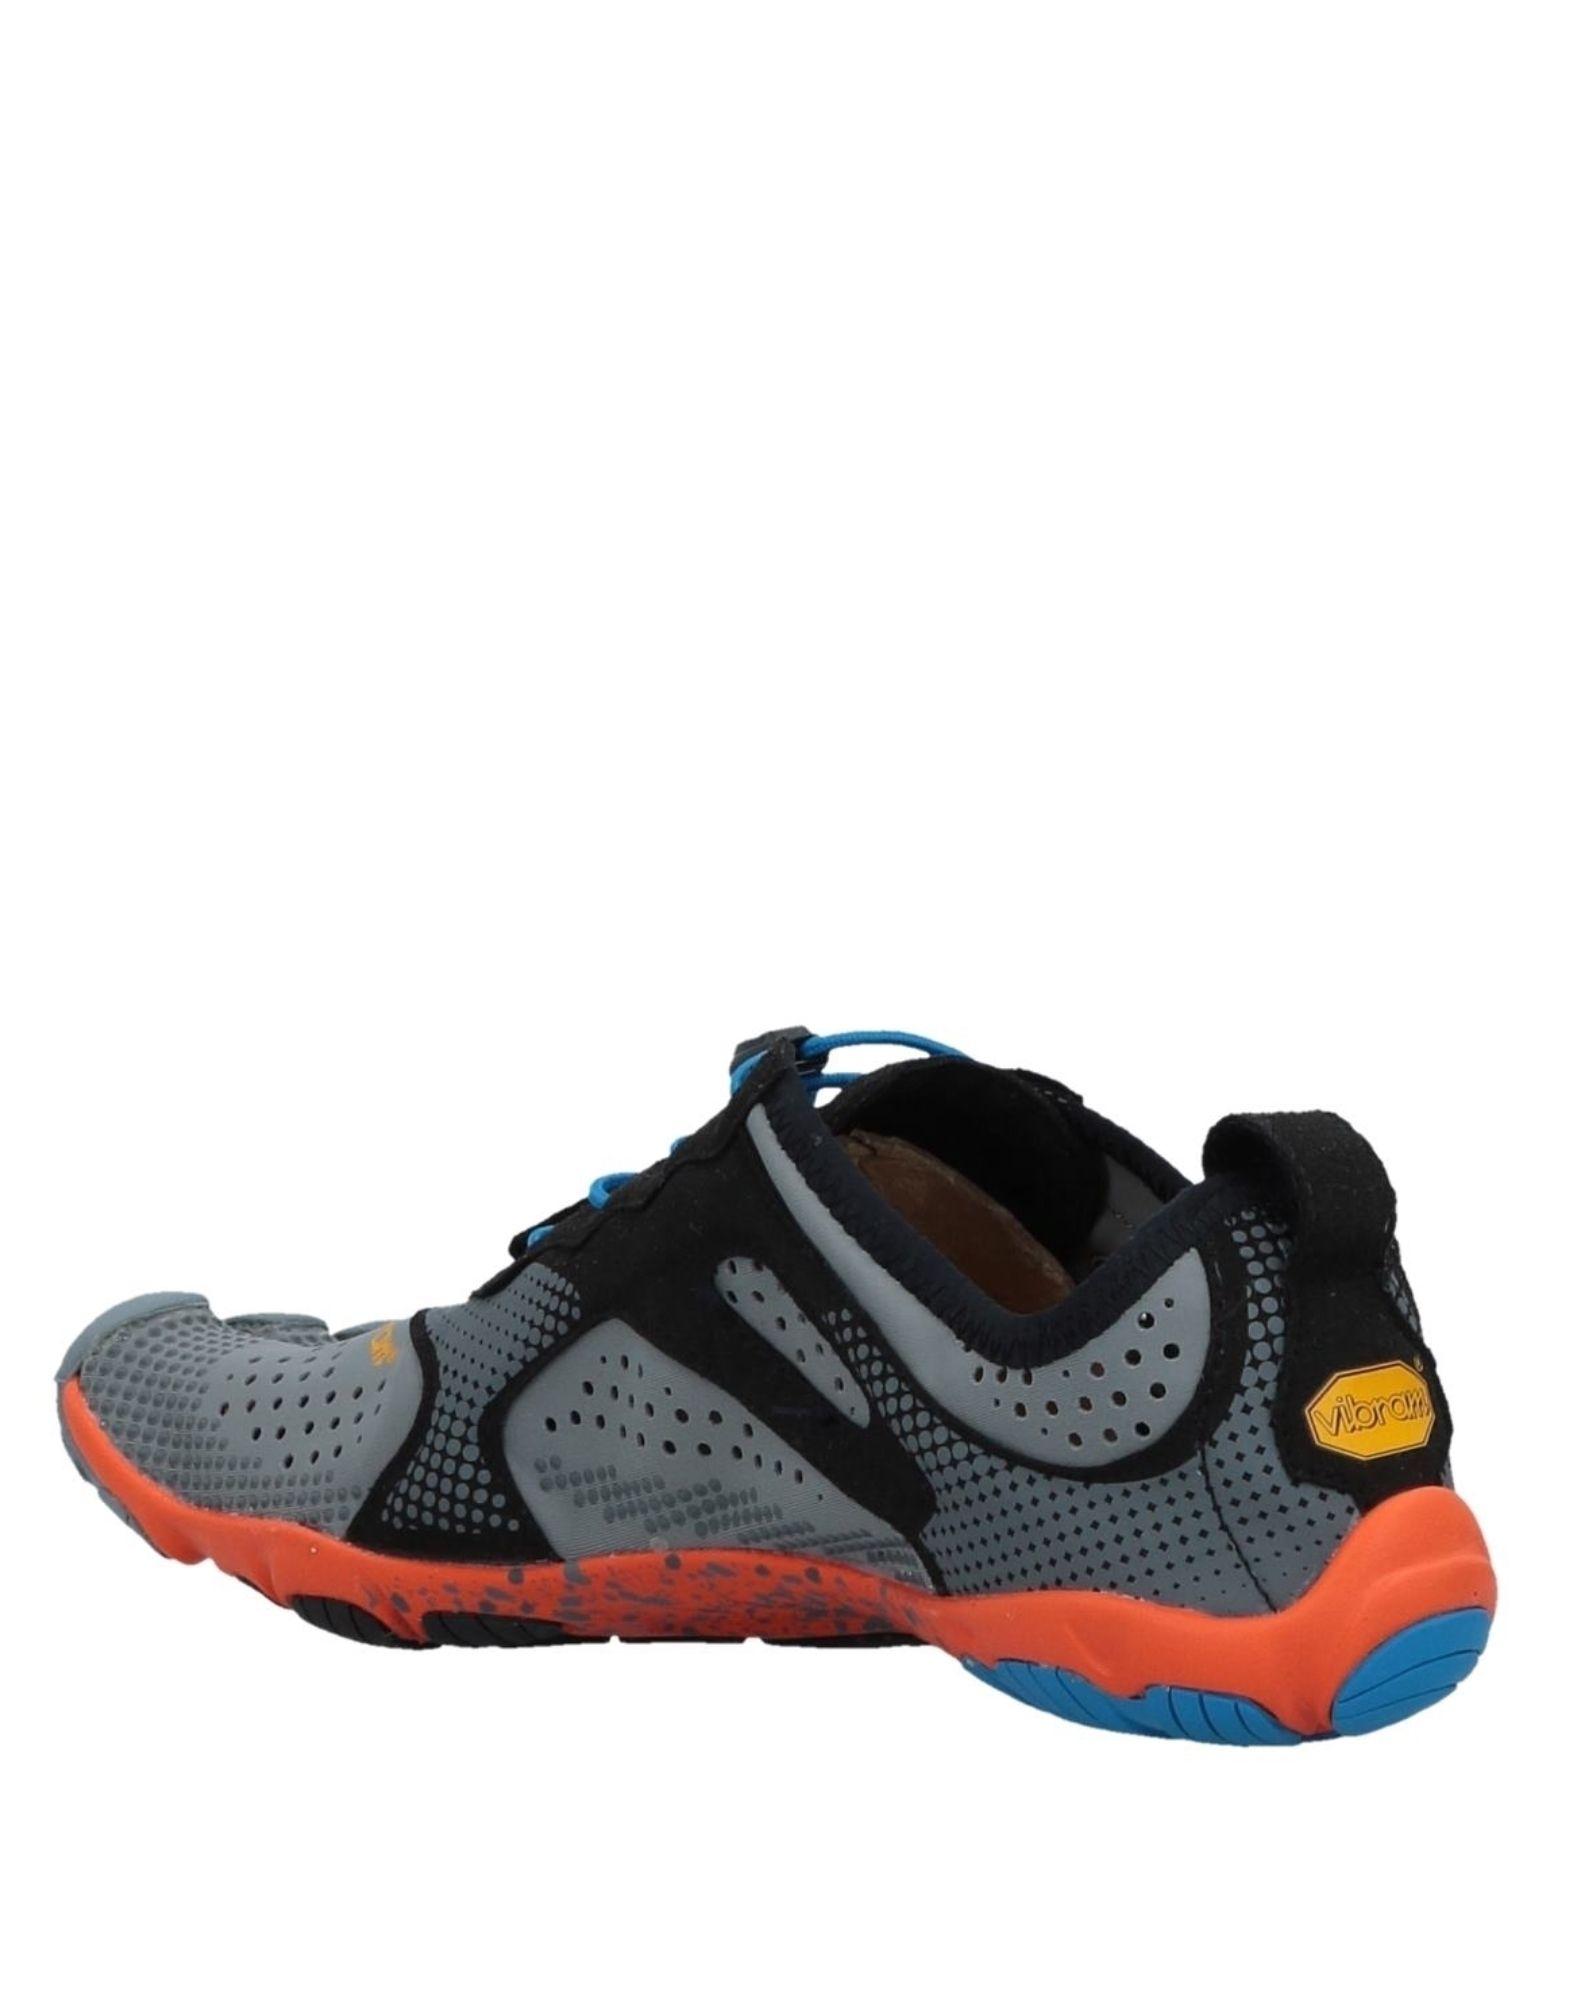 Rabatt echte  Schuhe Vibram Sneakers Herren  echte 11522686JJ a4060b